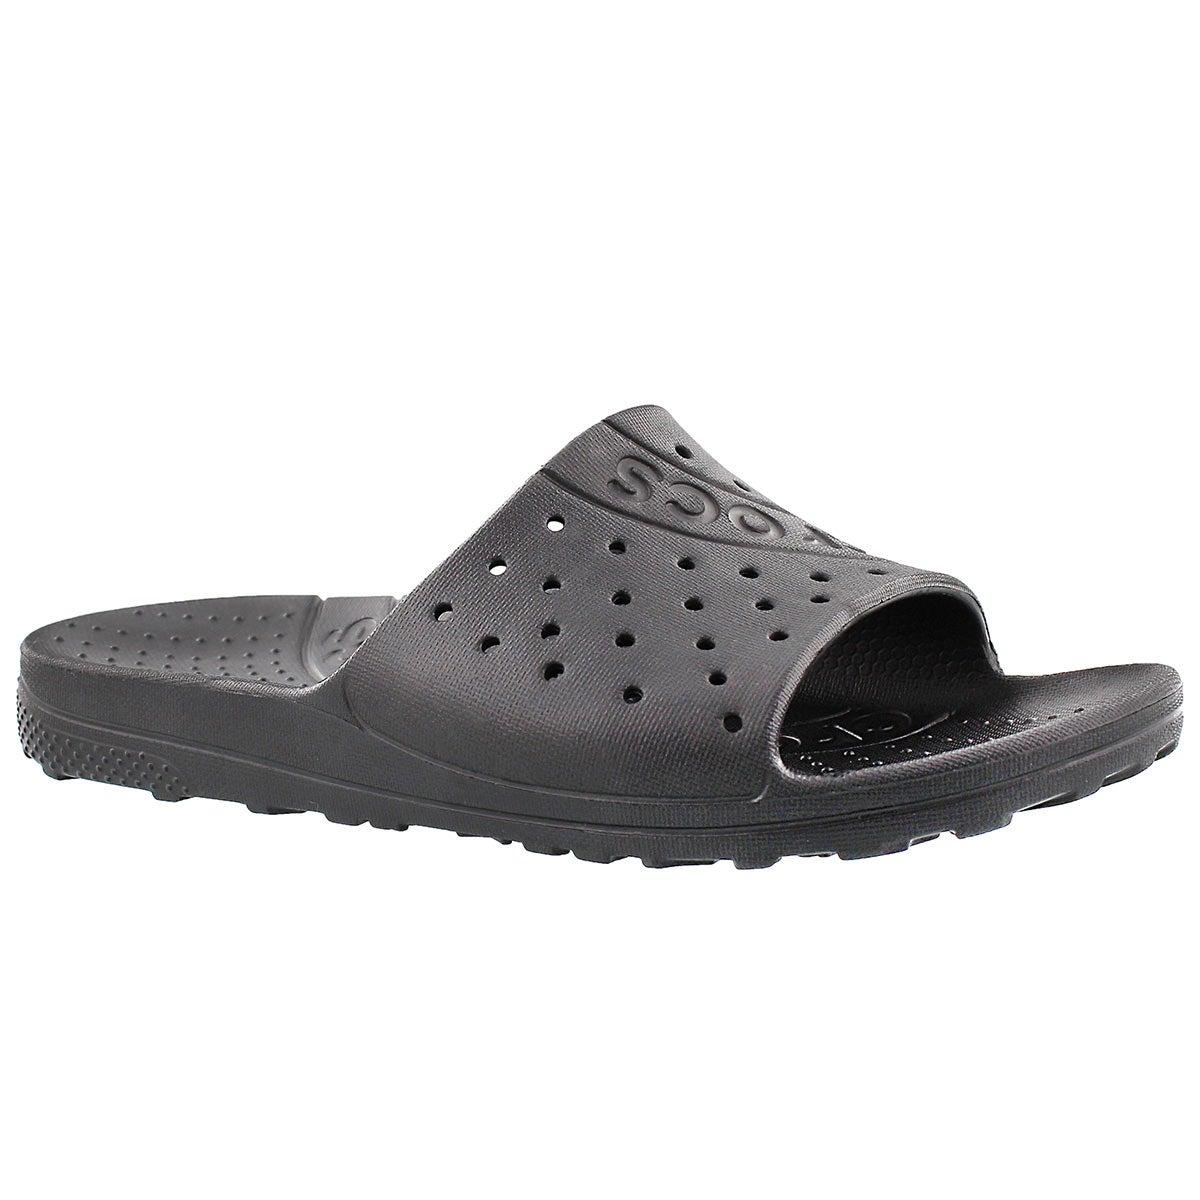 Mns Chawaii black slide sandal